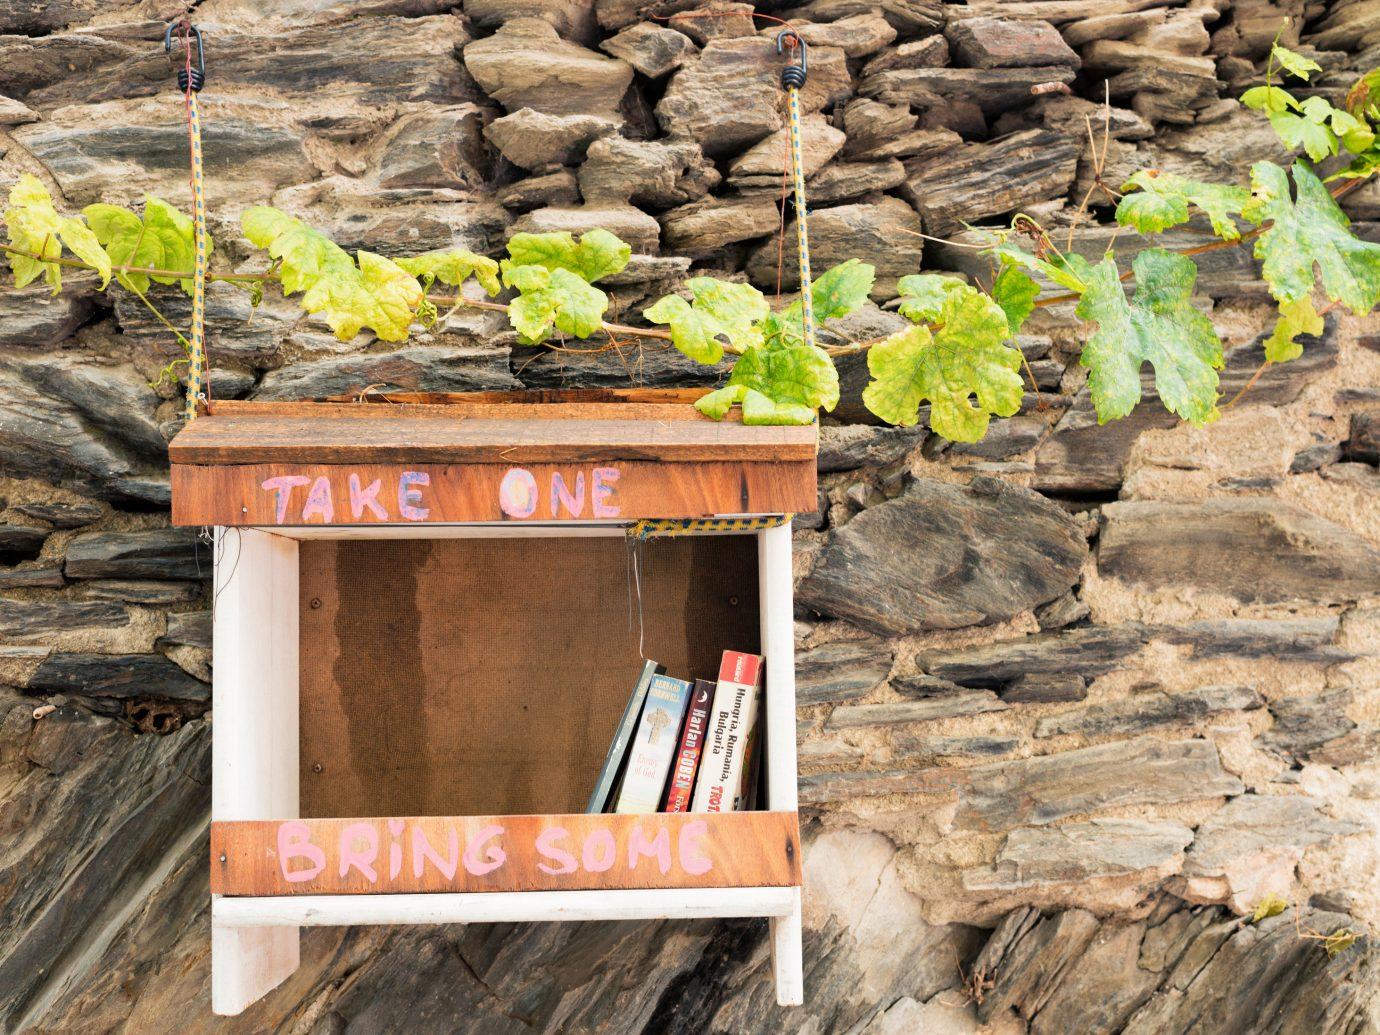 europe Spain Trip Ideas plant wood soil flower